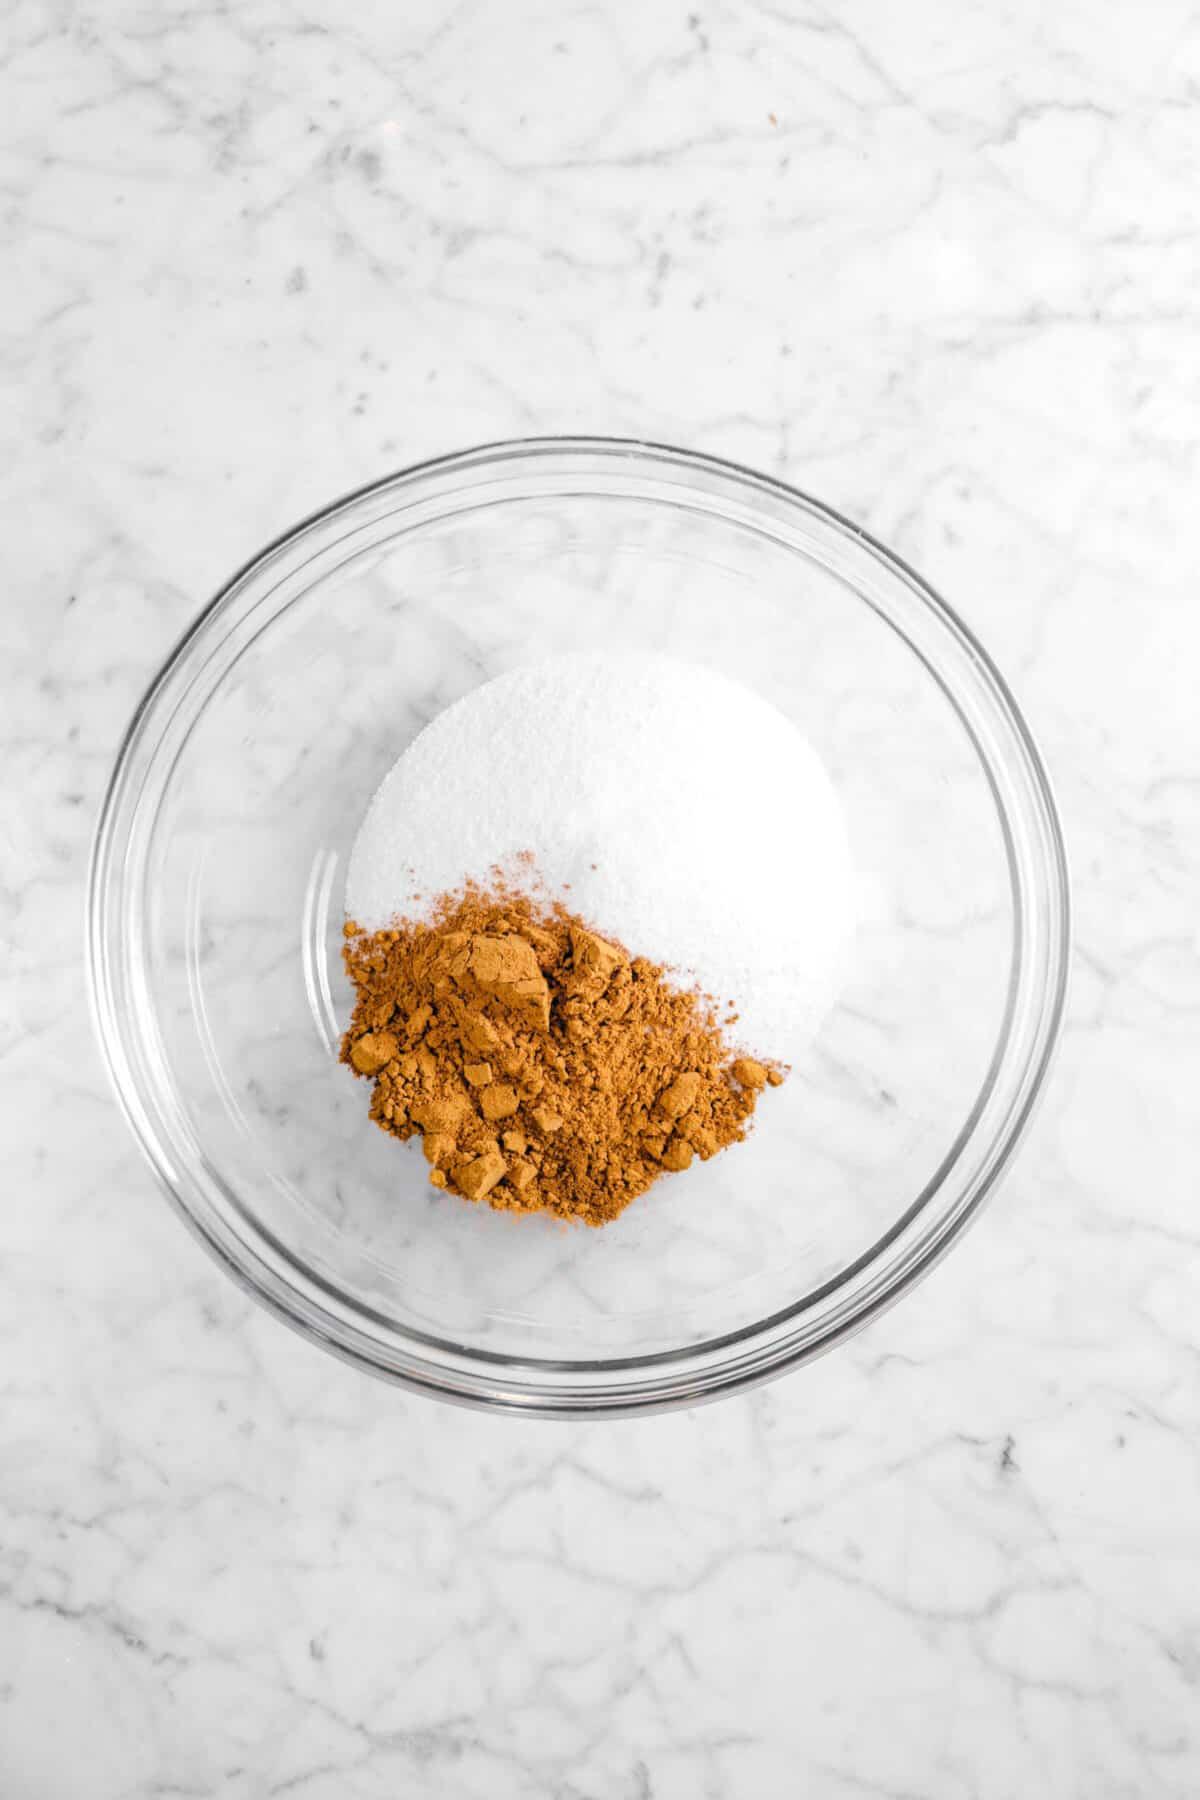 cinnamon and sugar in a glass bowl